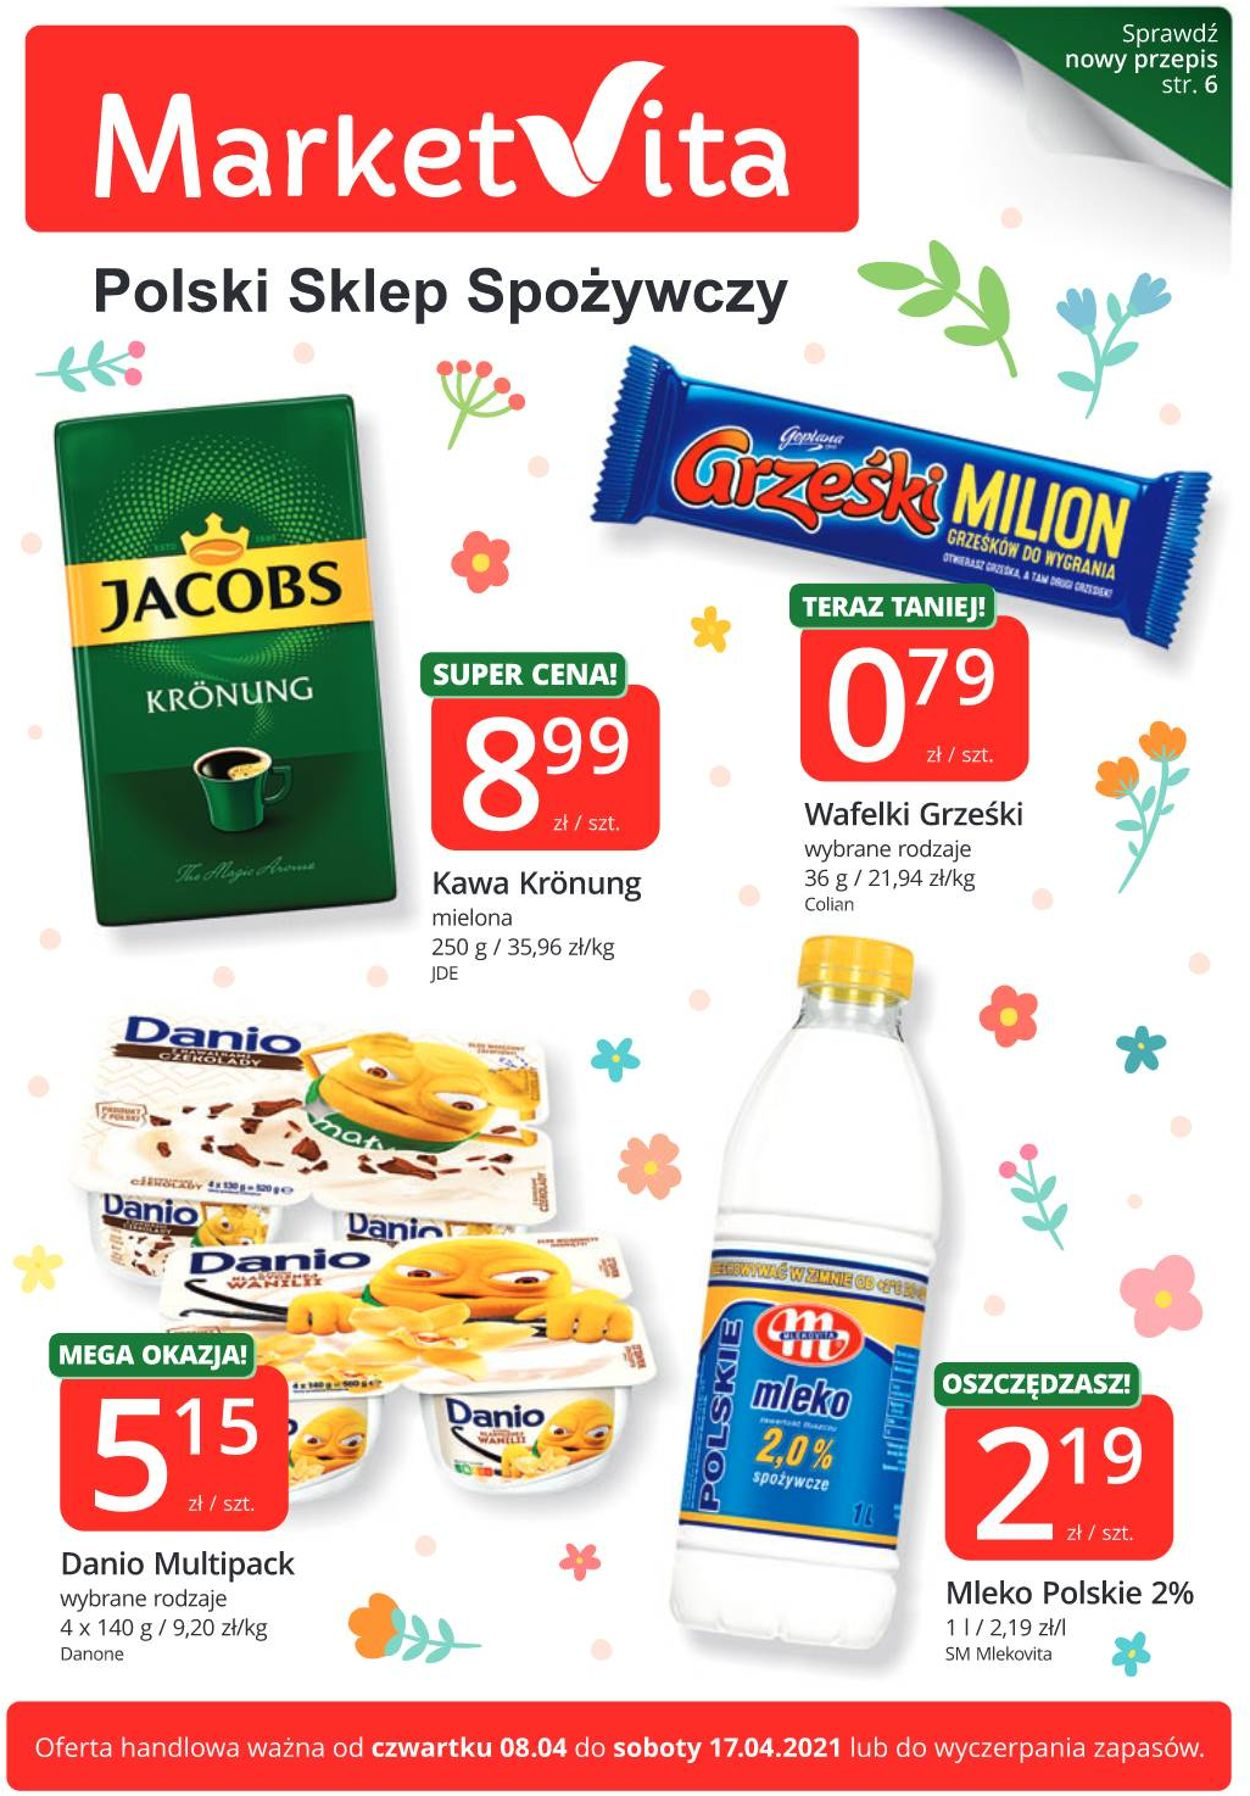 Gazetka promocyjna MarketVita - 08.04-17.04.2021